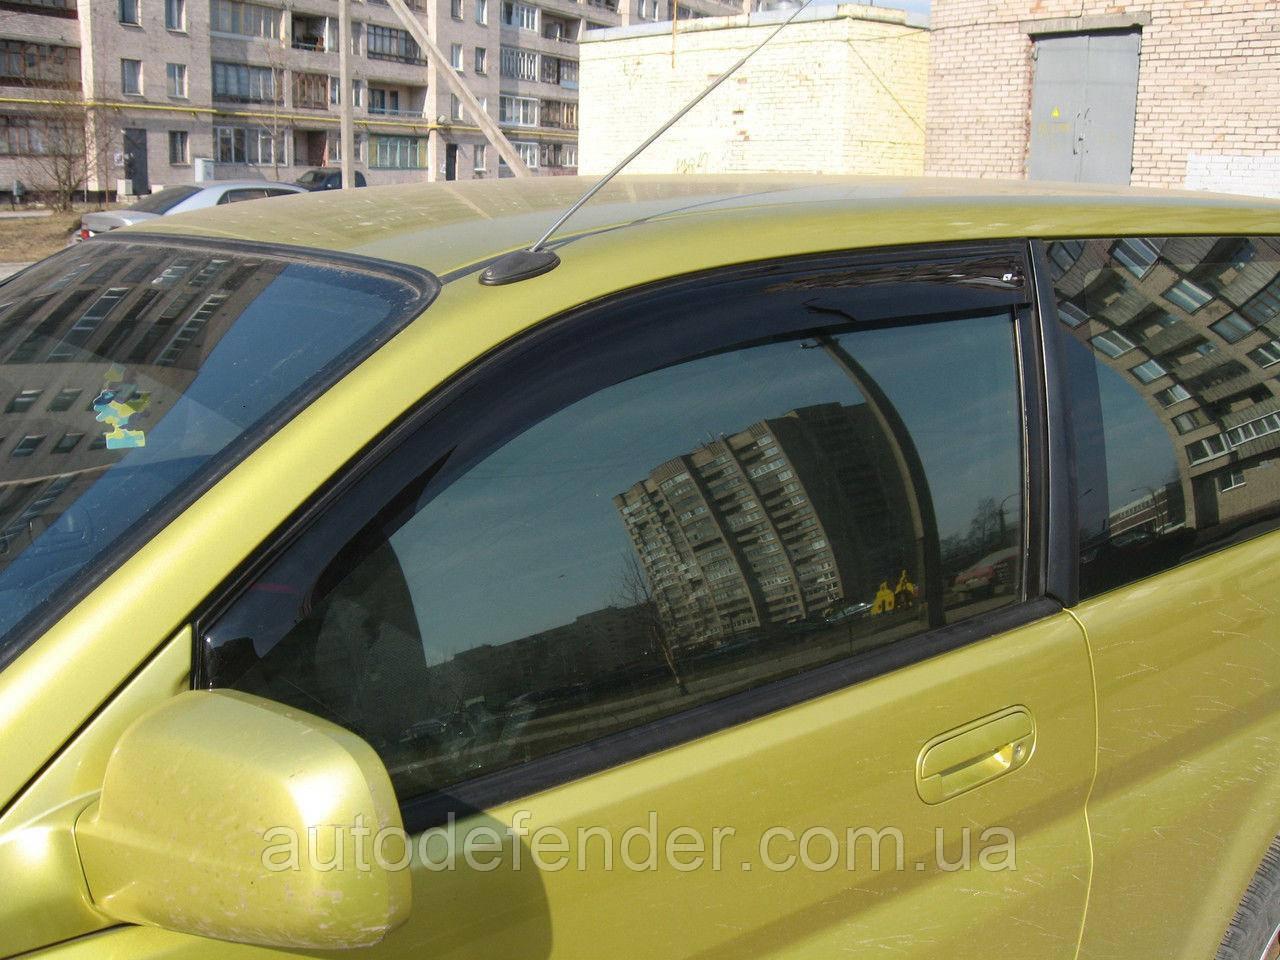 Дефлекторы окон (ветровики) Honda HR-V 3d 1998-2005, Cobra Tuning - VL, H10898